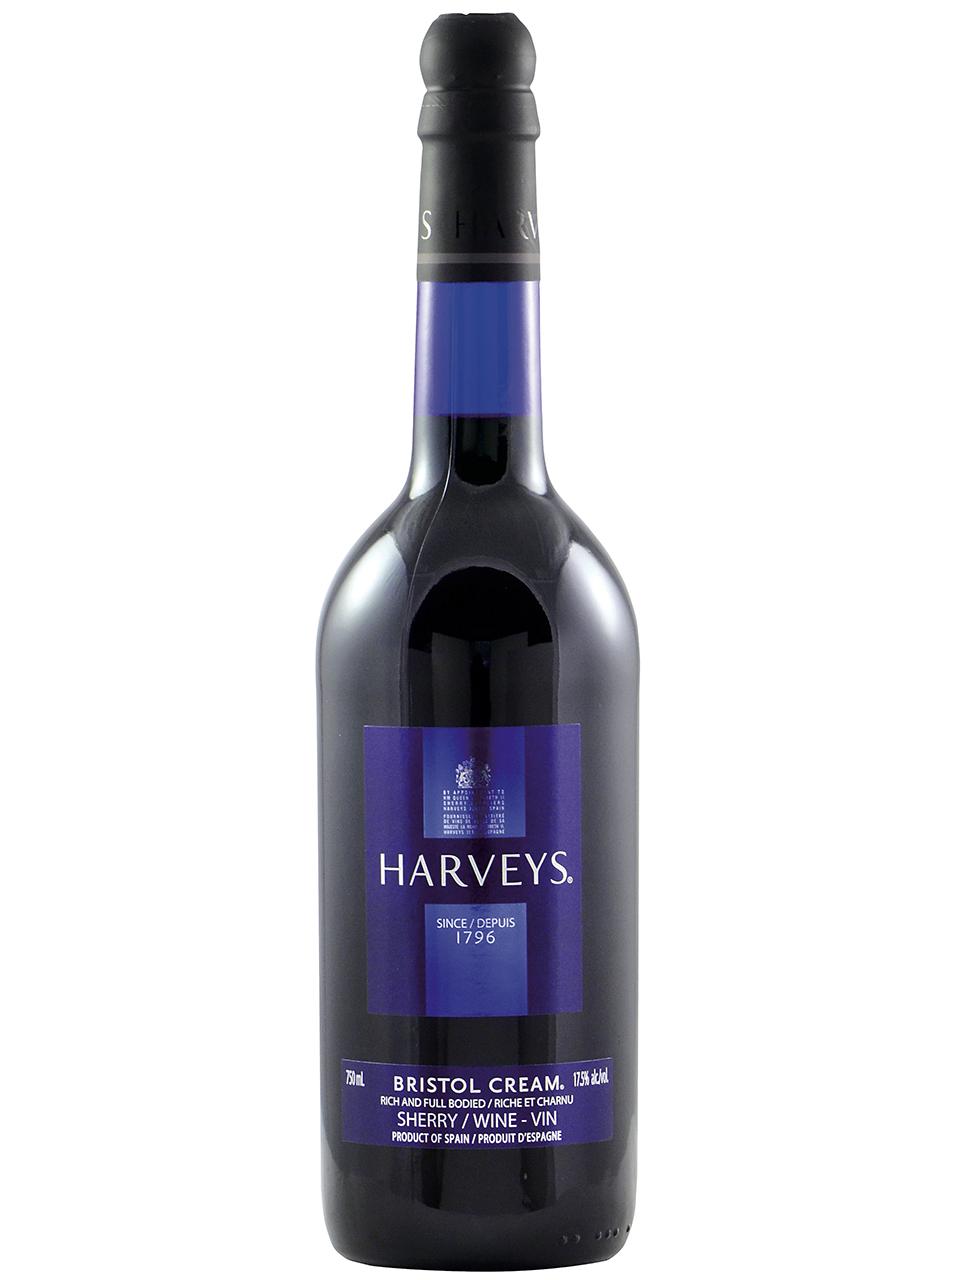 Harveys Bristol Cream Sherry